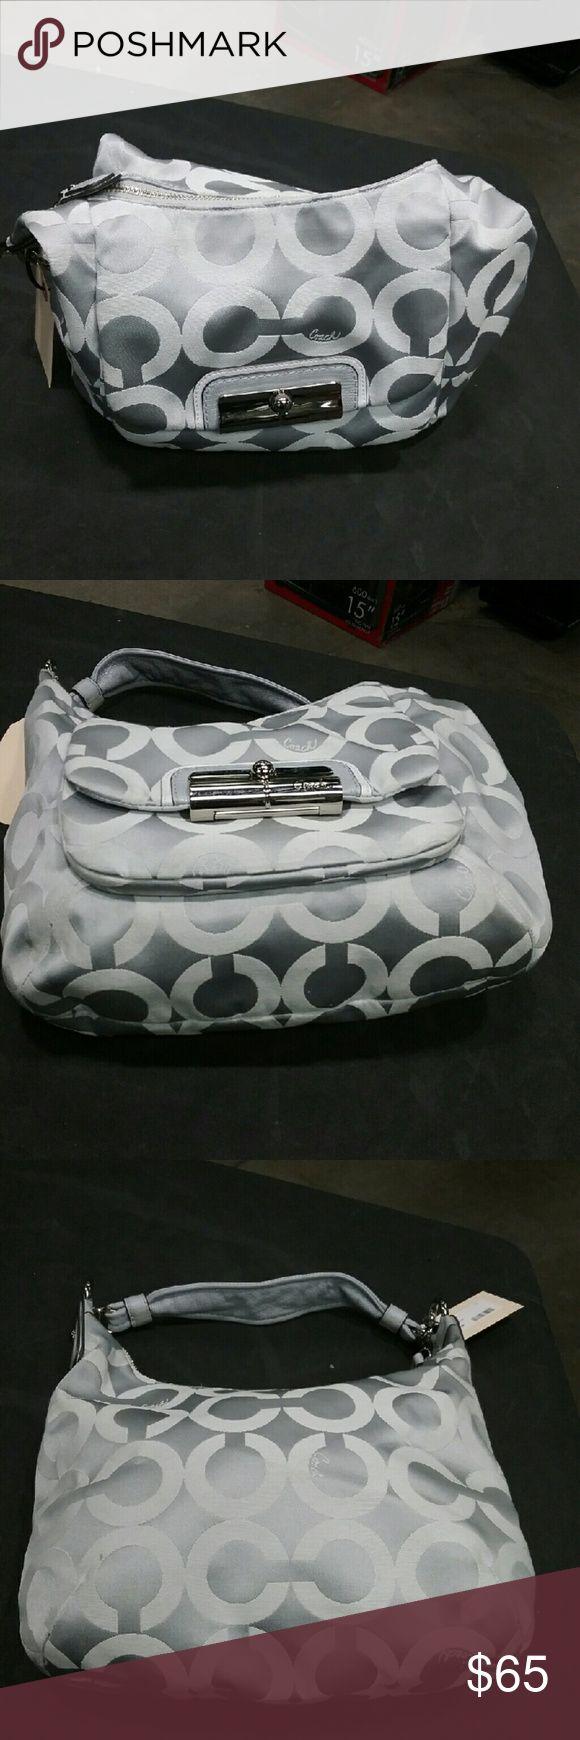 Coach silver shoulder bag Shoulder bag  Silver  Coach Coach Bags Shoulder Bags